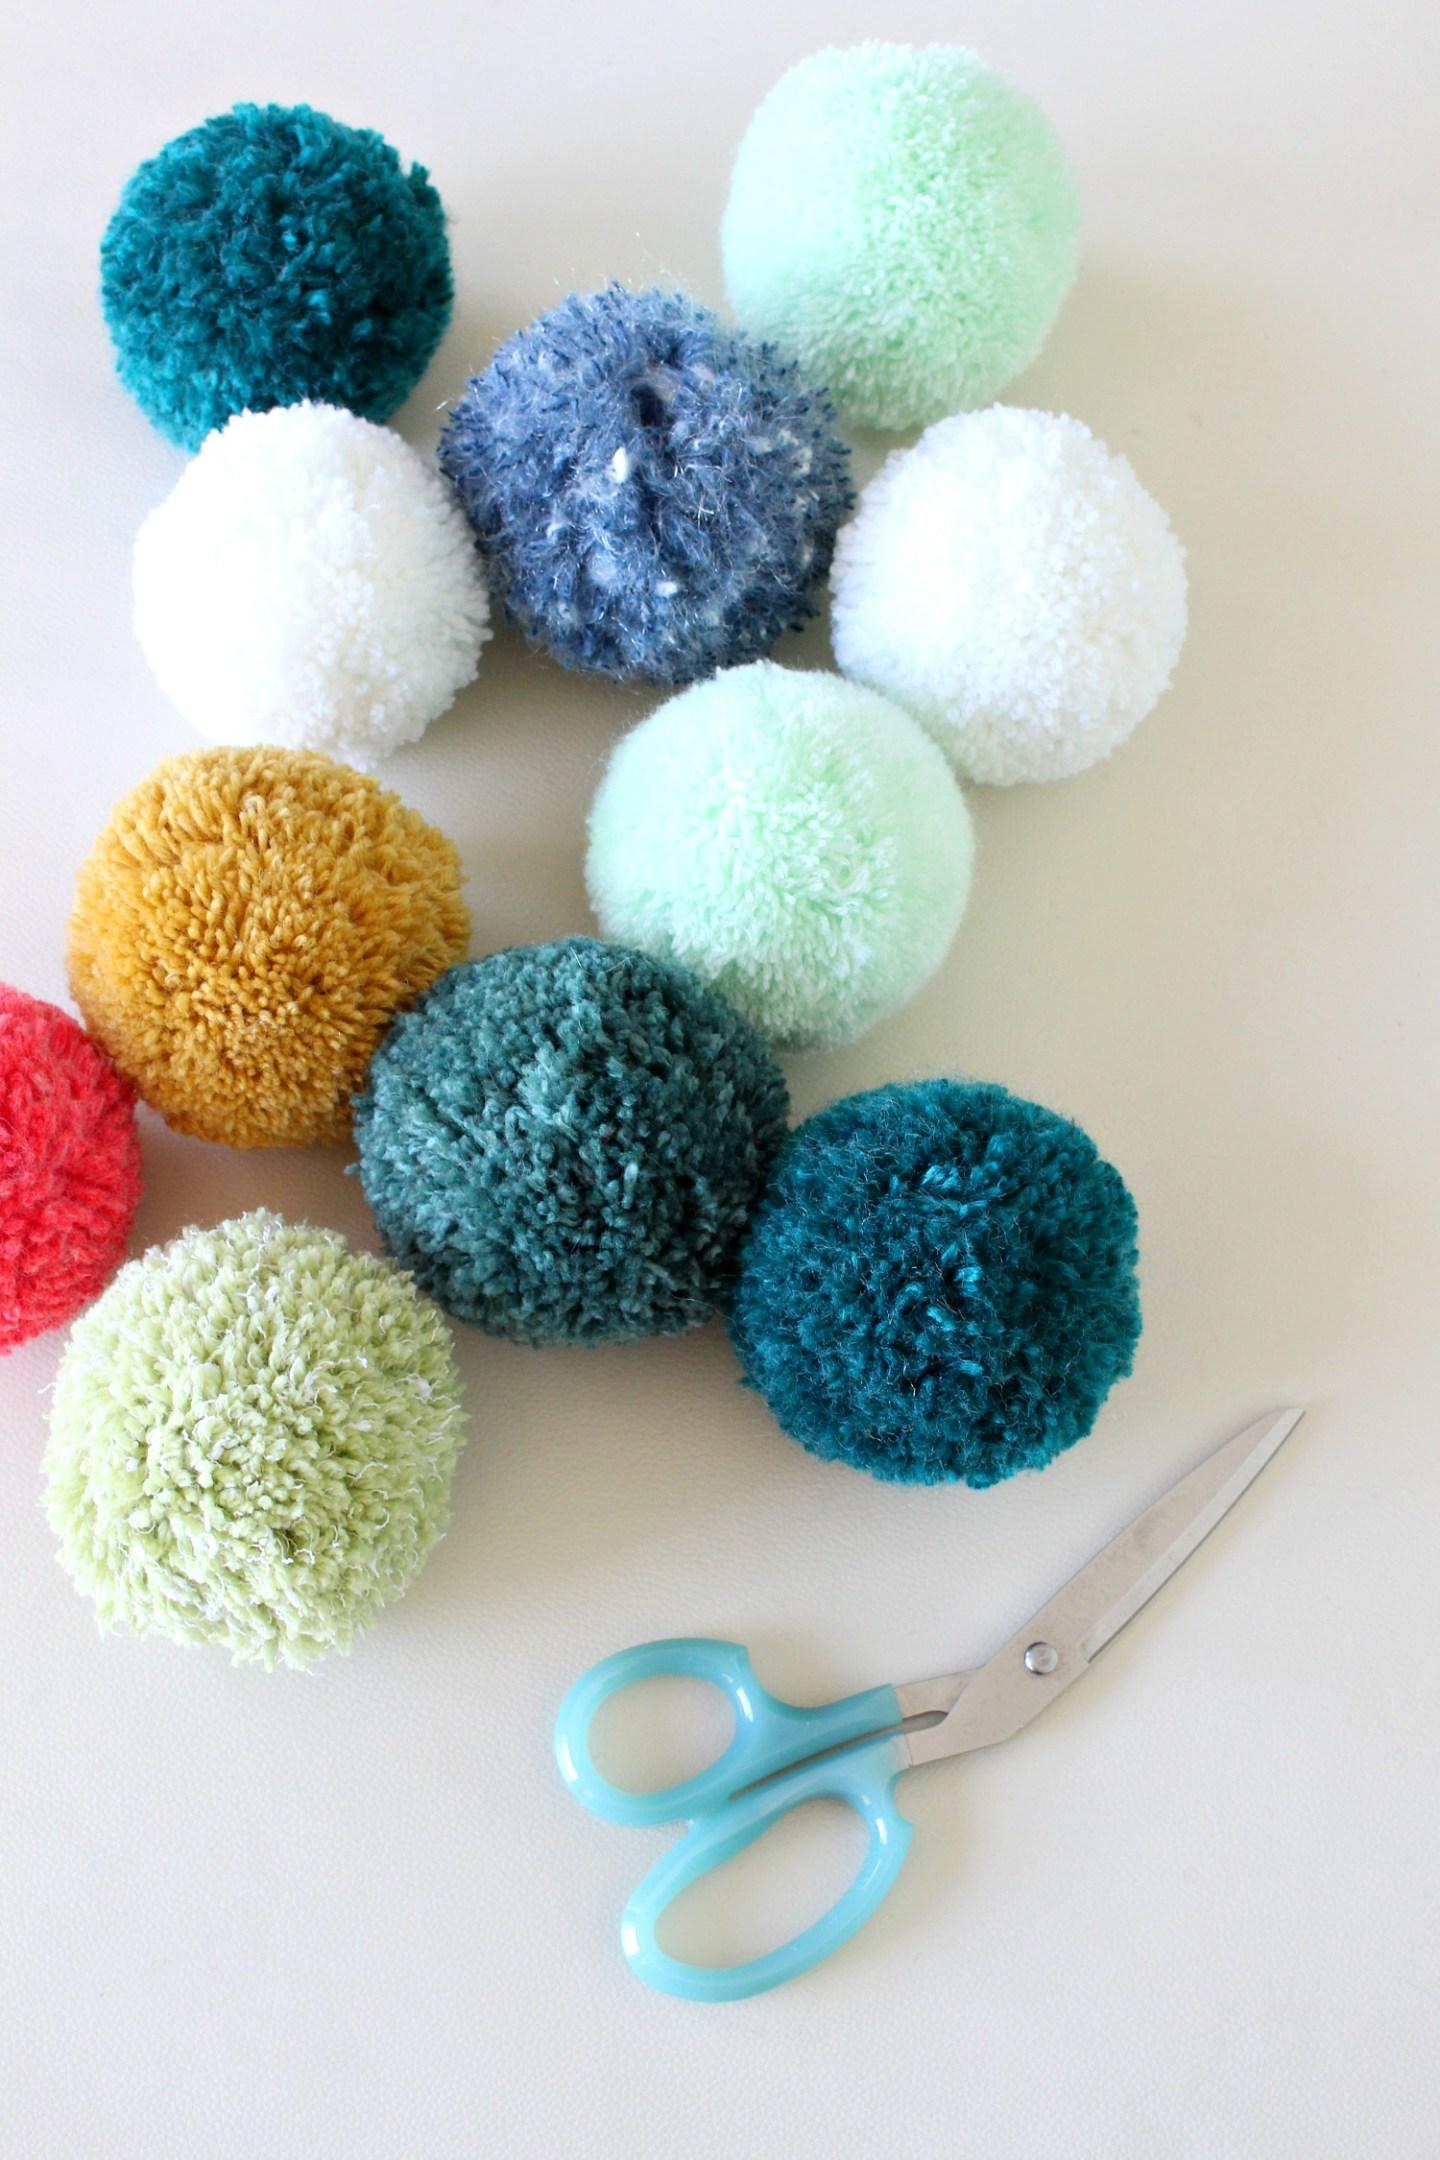 pom pom crafts for kids